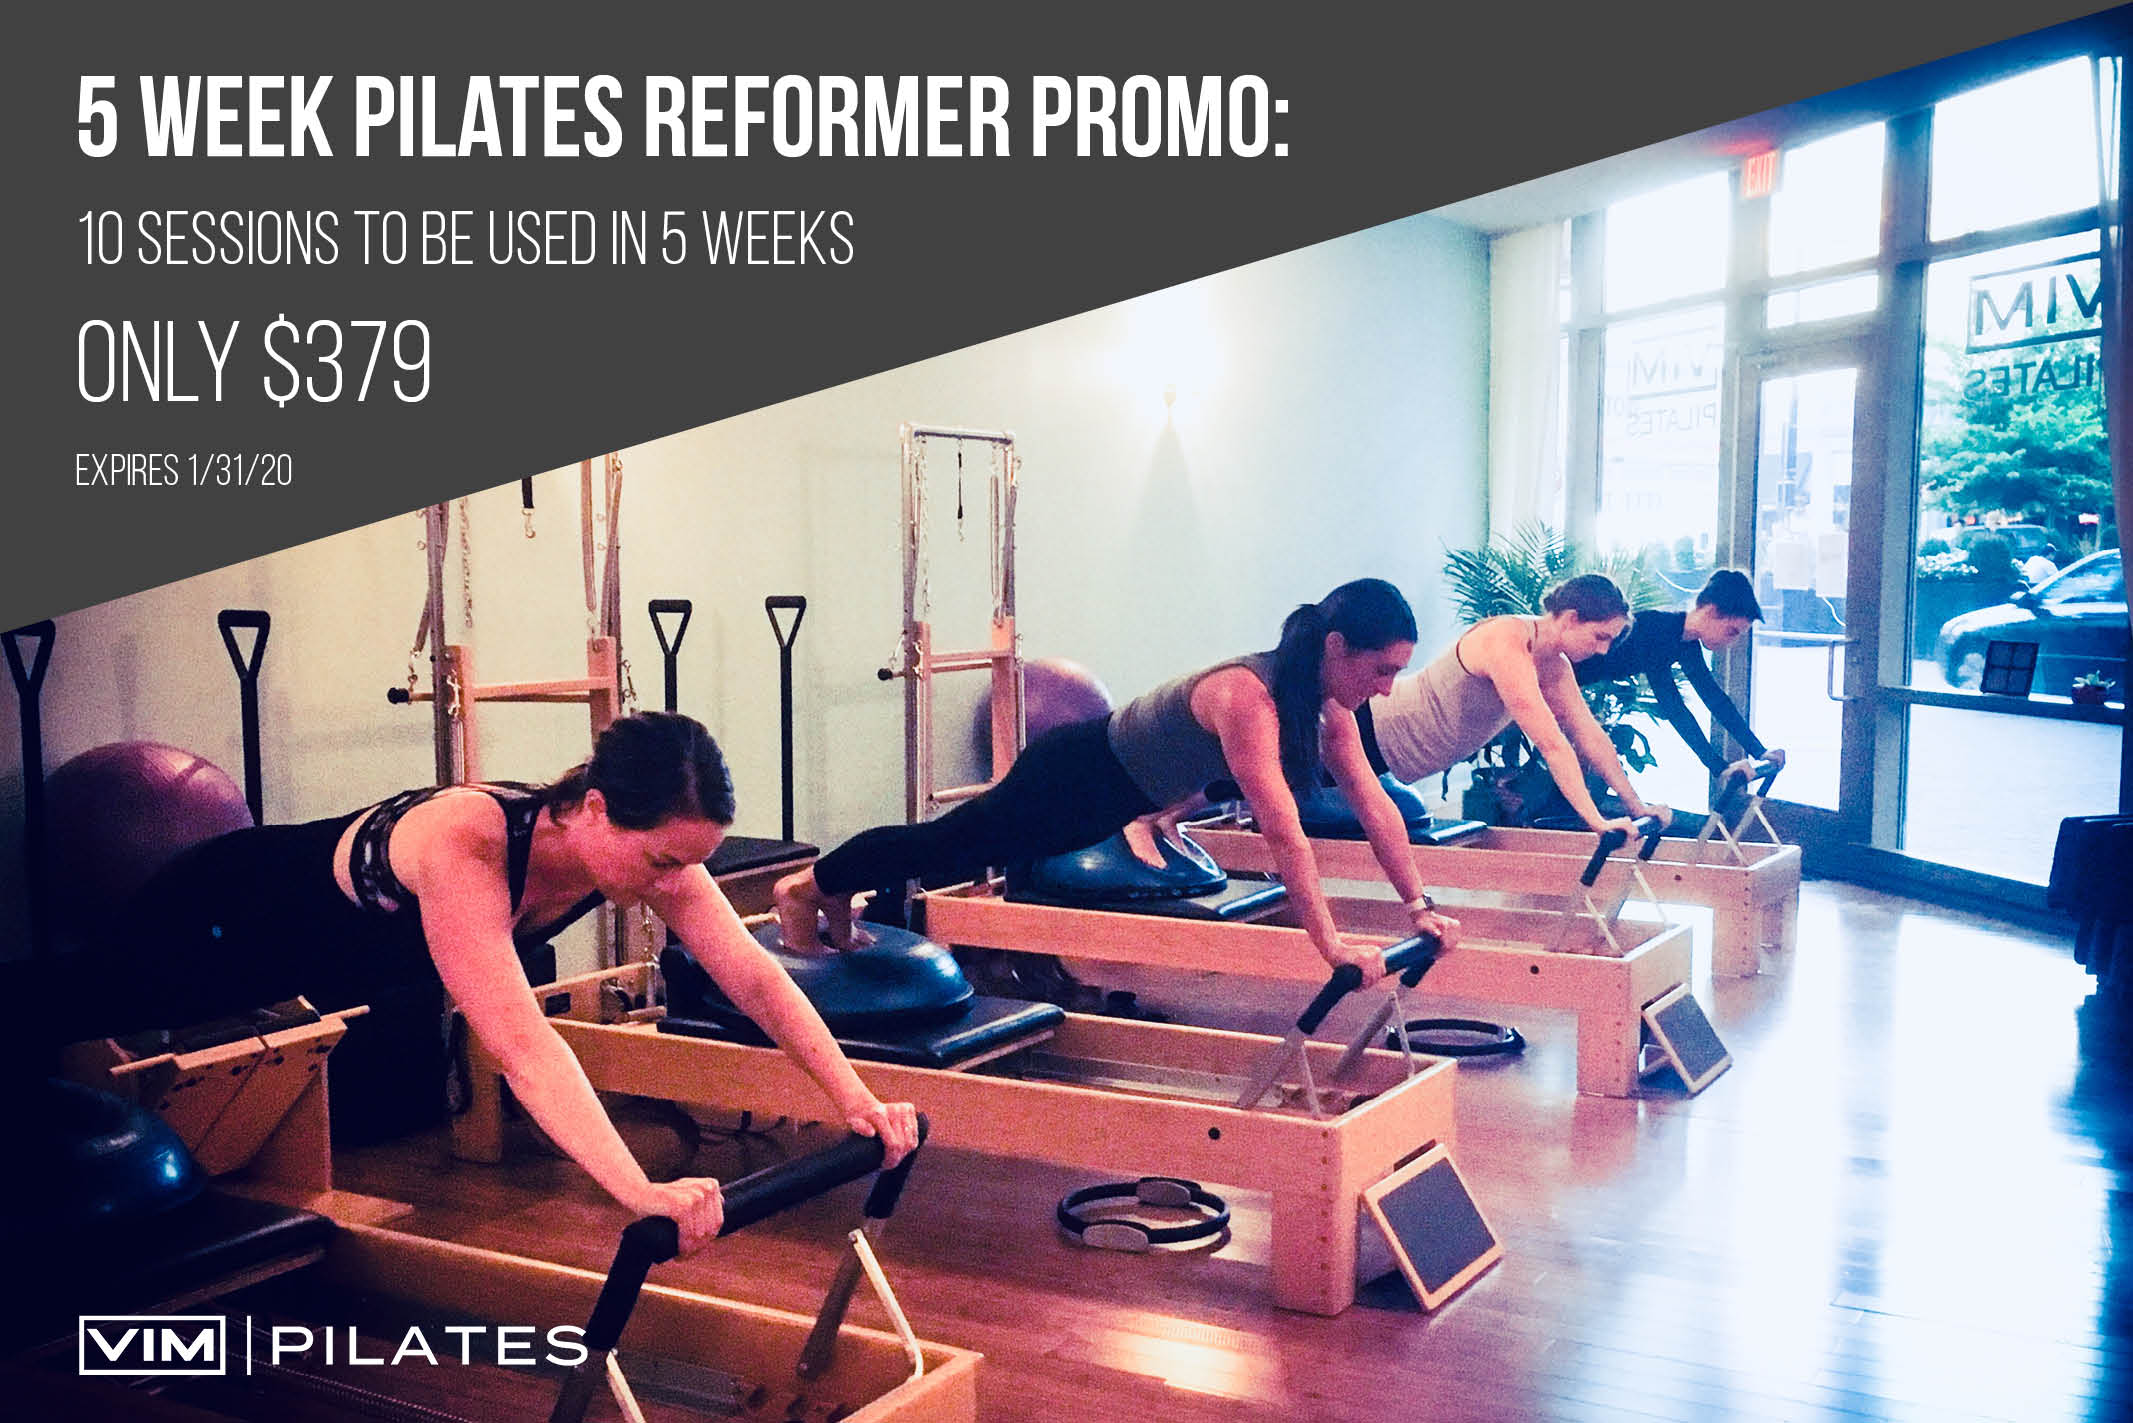 5 week Pilates reformer promo